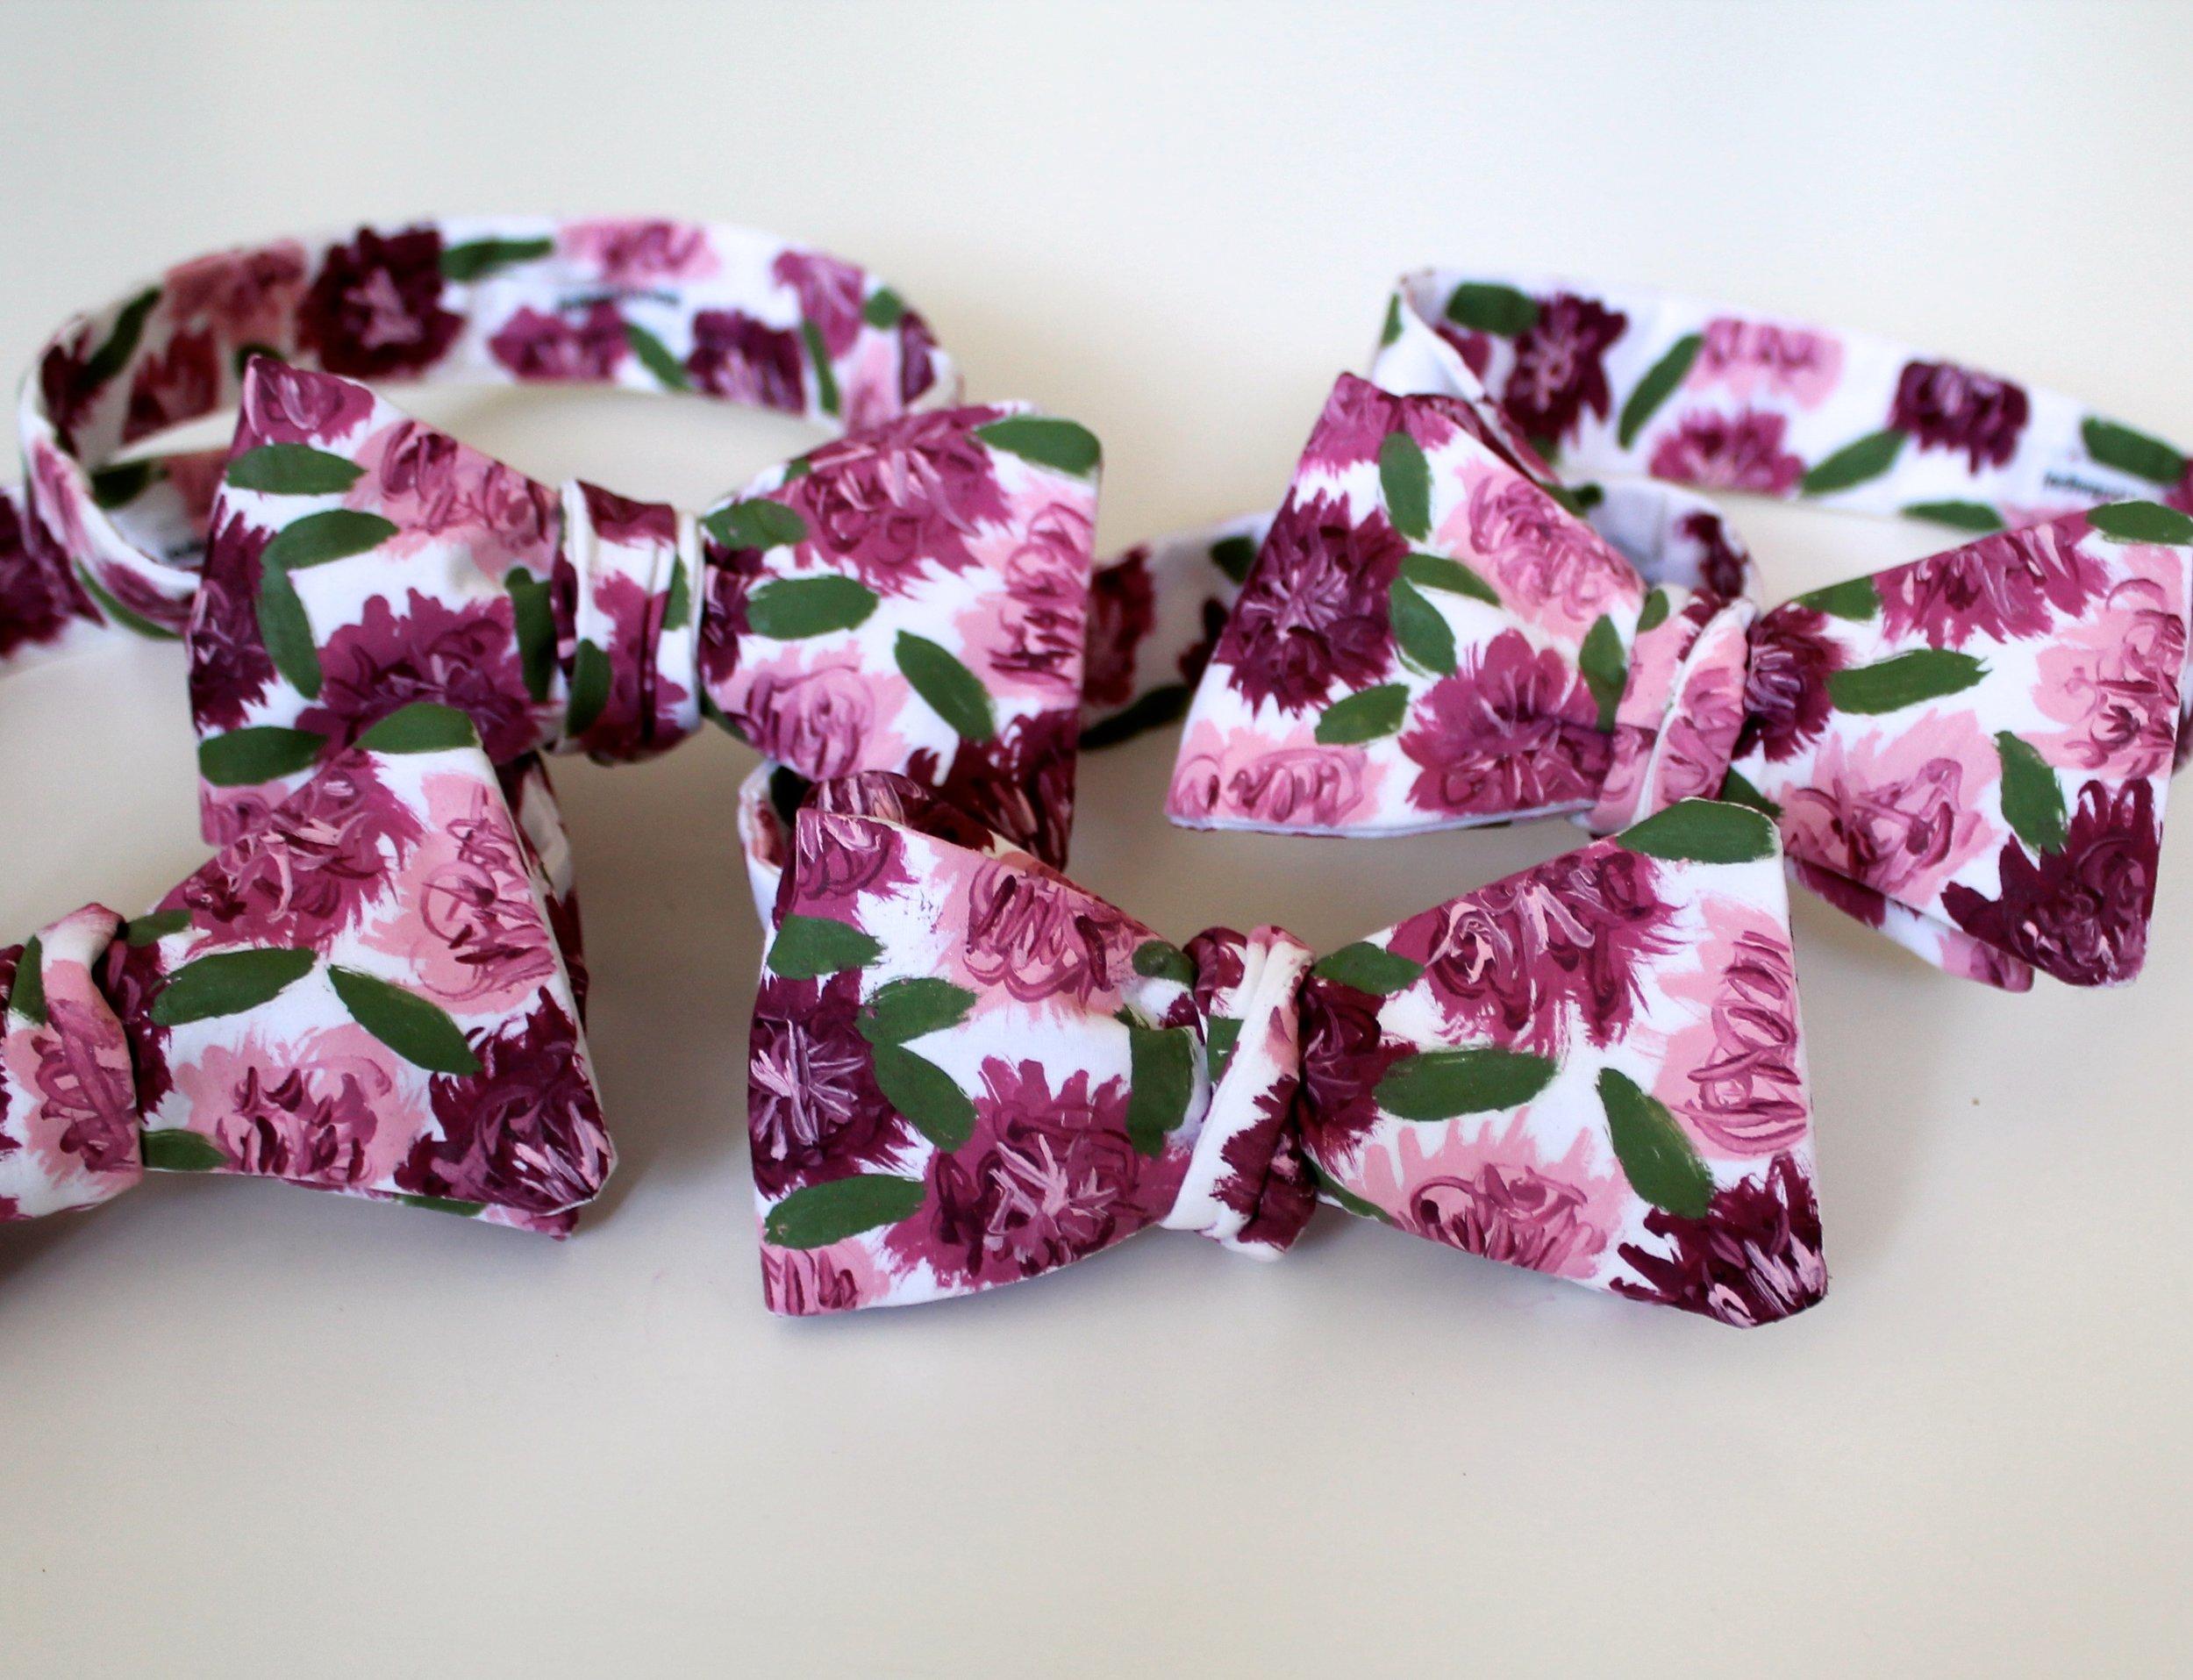 edward kwan hand painted bow ties melbourne.JPG